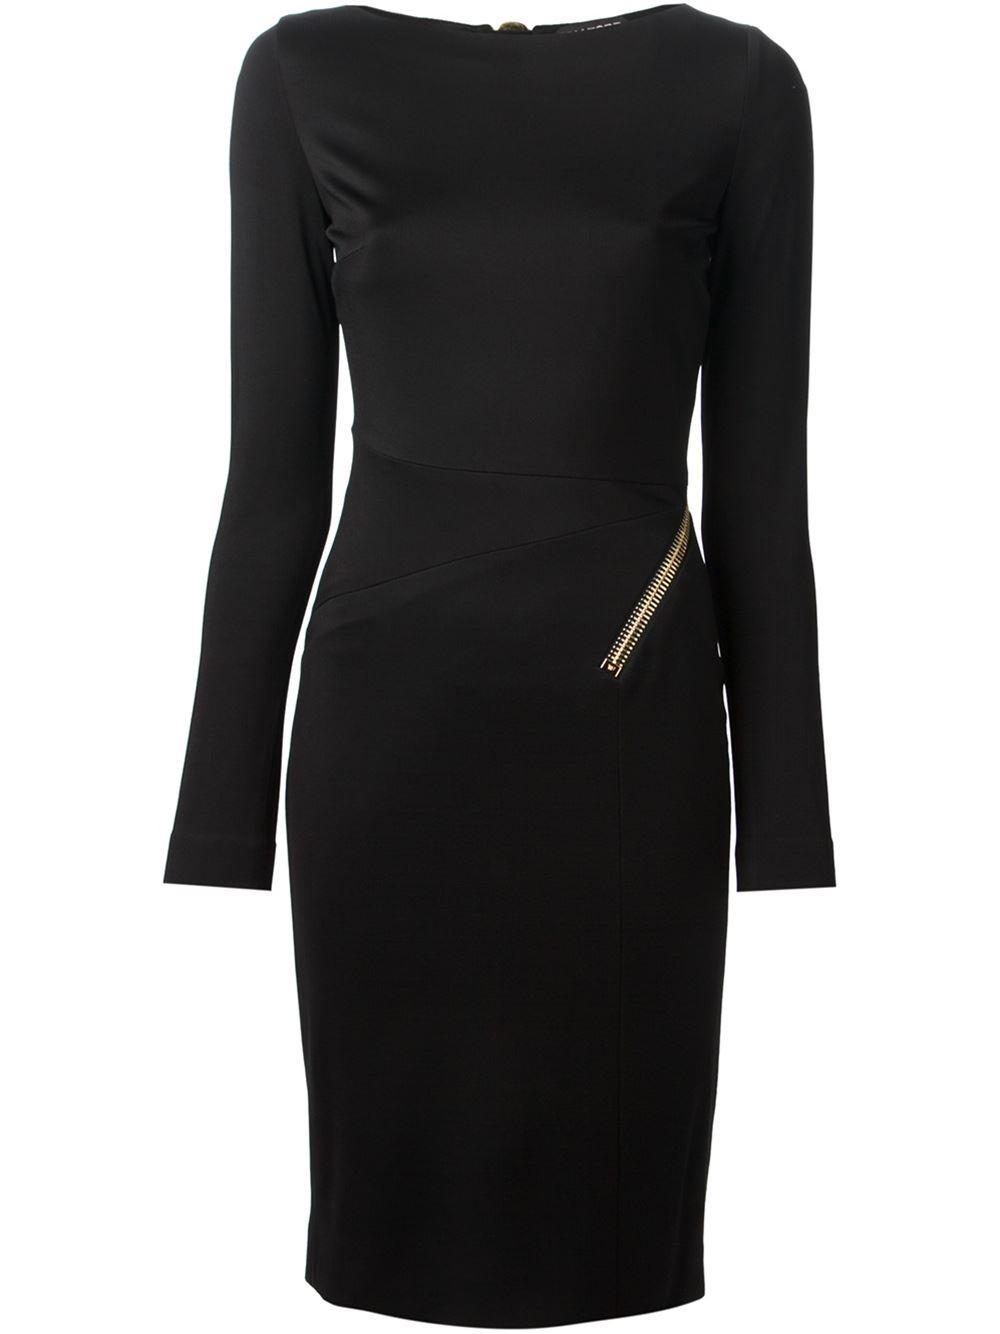 tom ford zip detail pencil dress in black lyst. Black Bedroom Furniture Sets. Home Design Ideas